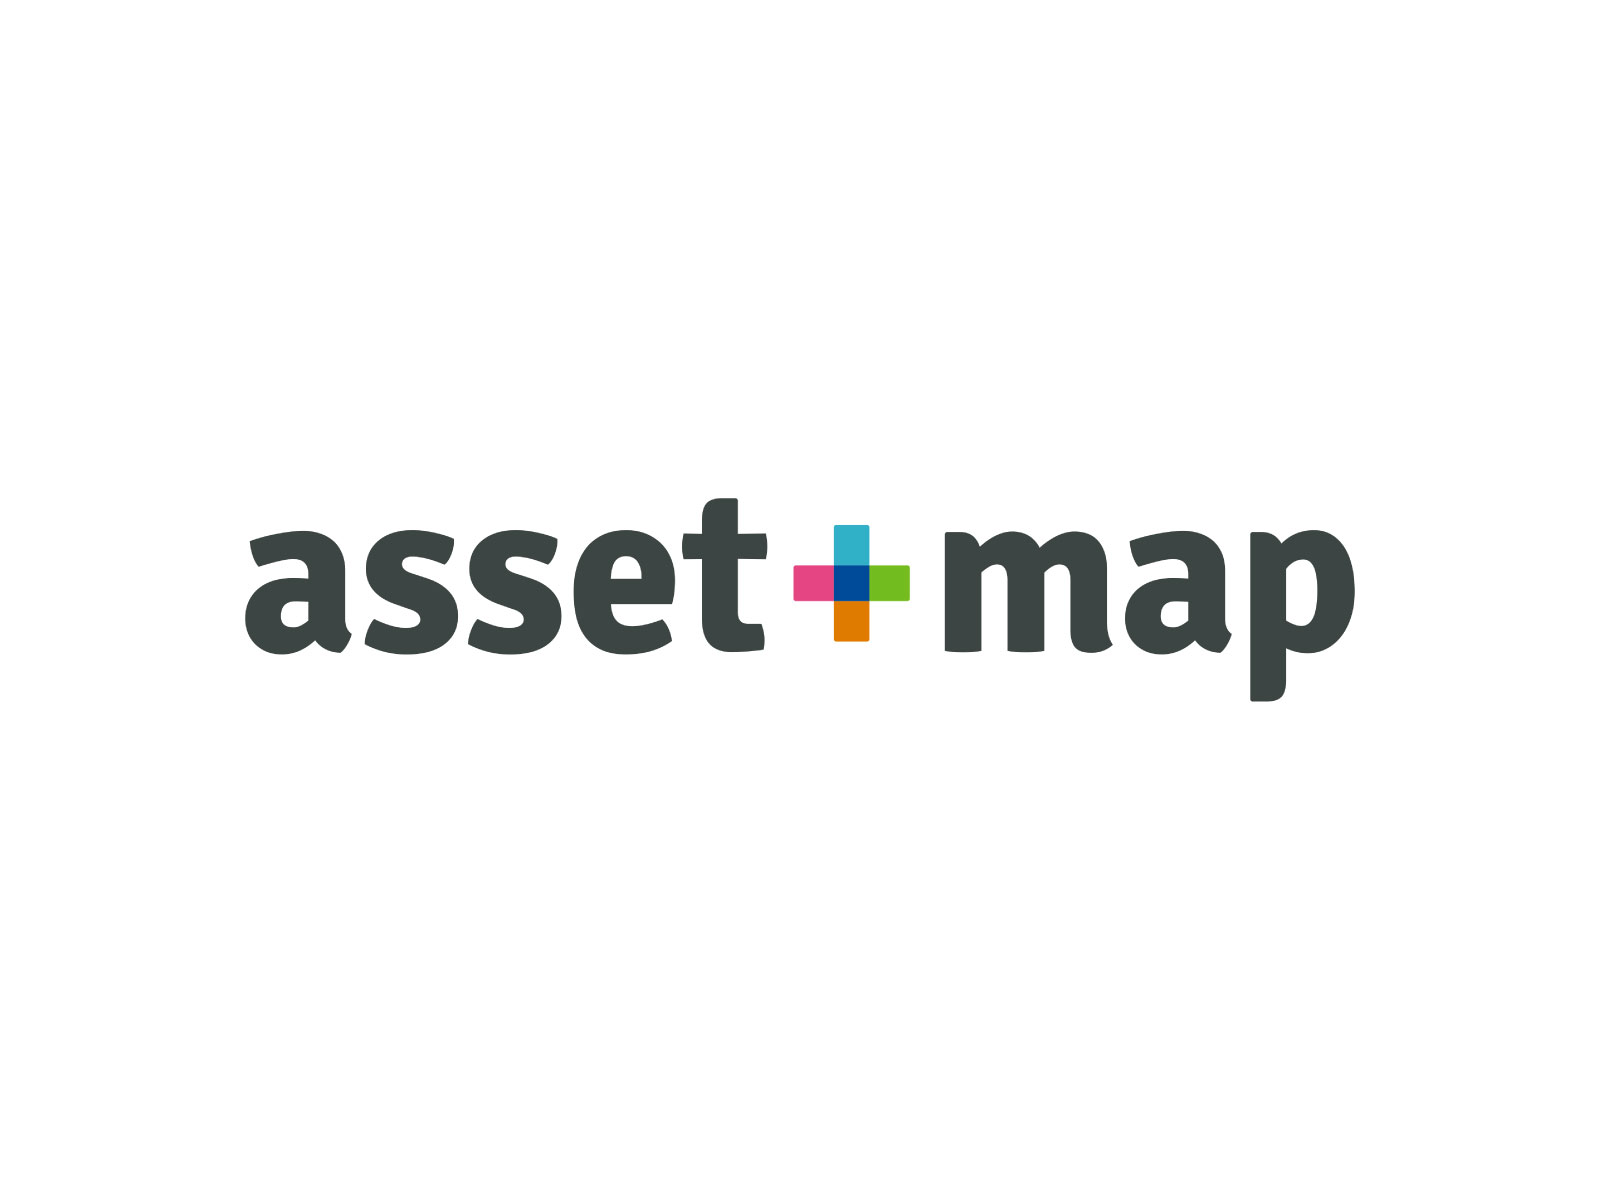 David_Landon_Voice_Actor_assetmap.jpg